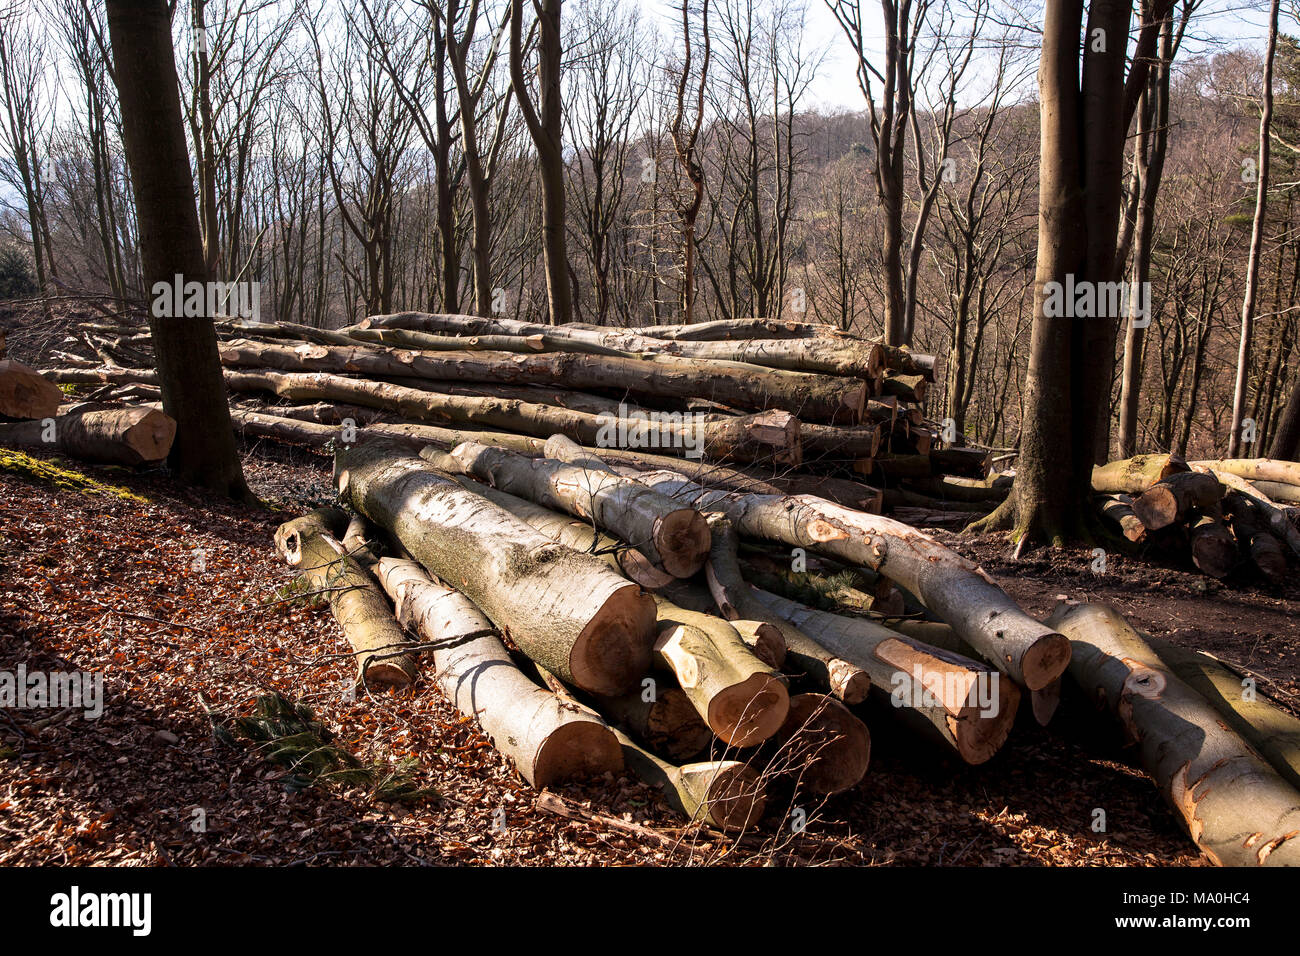 Germany, felled and stacked beech trees in the Ardey mountains near the city of Wetter.  Deutschland, Ruhrgebiet, gefaellte und gestapelte Buchenstaem Stock Photo